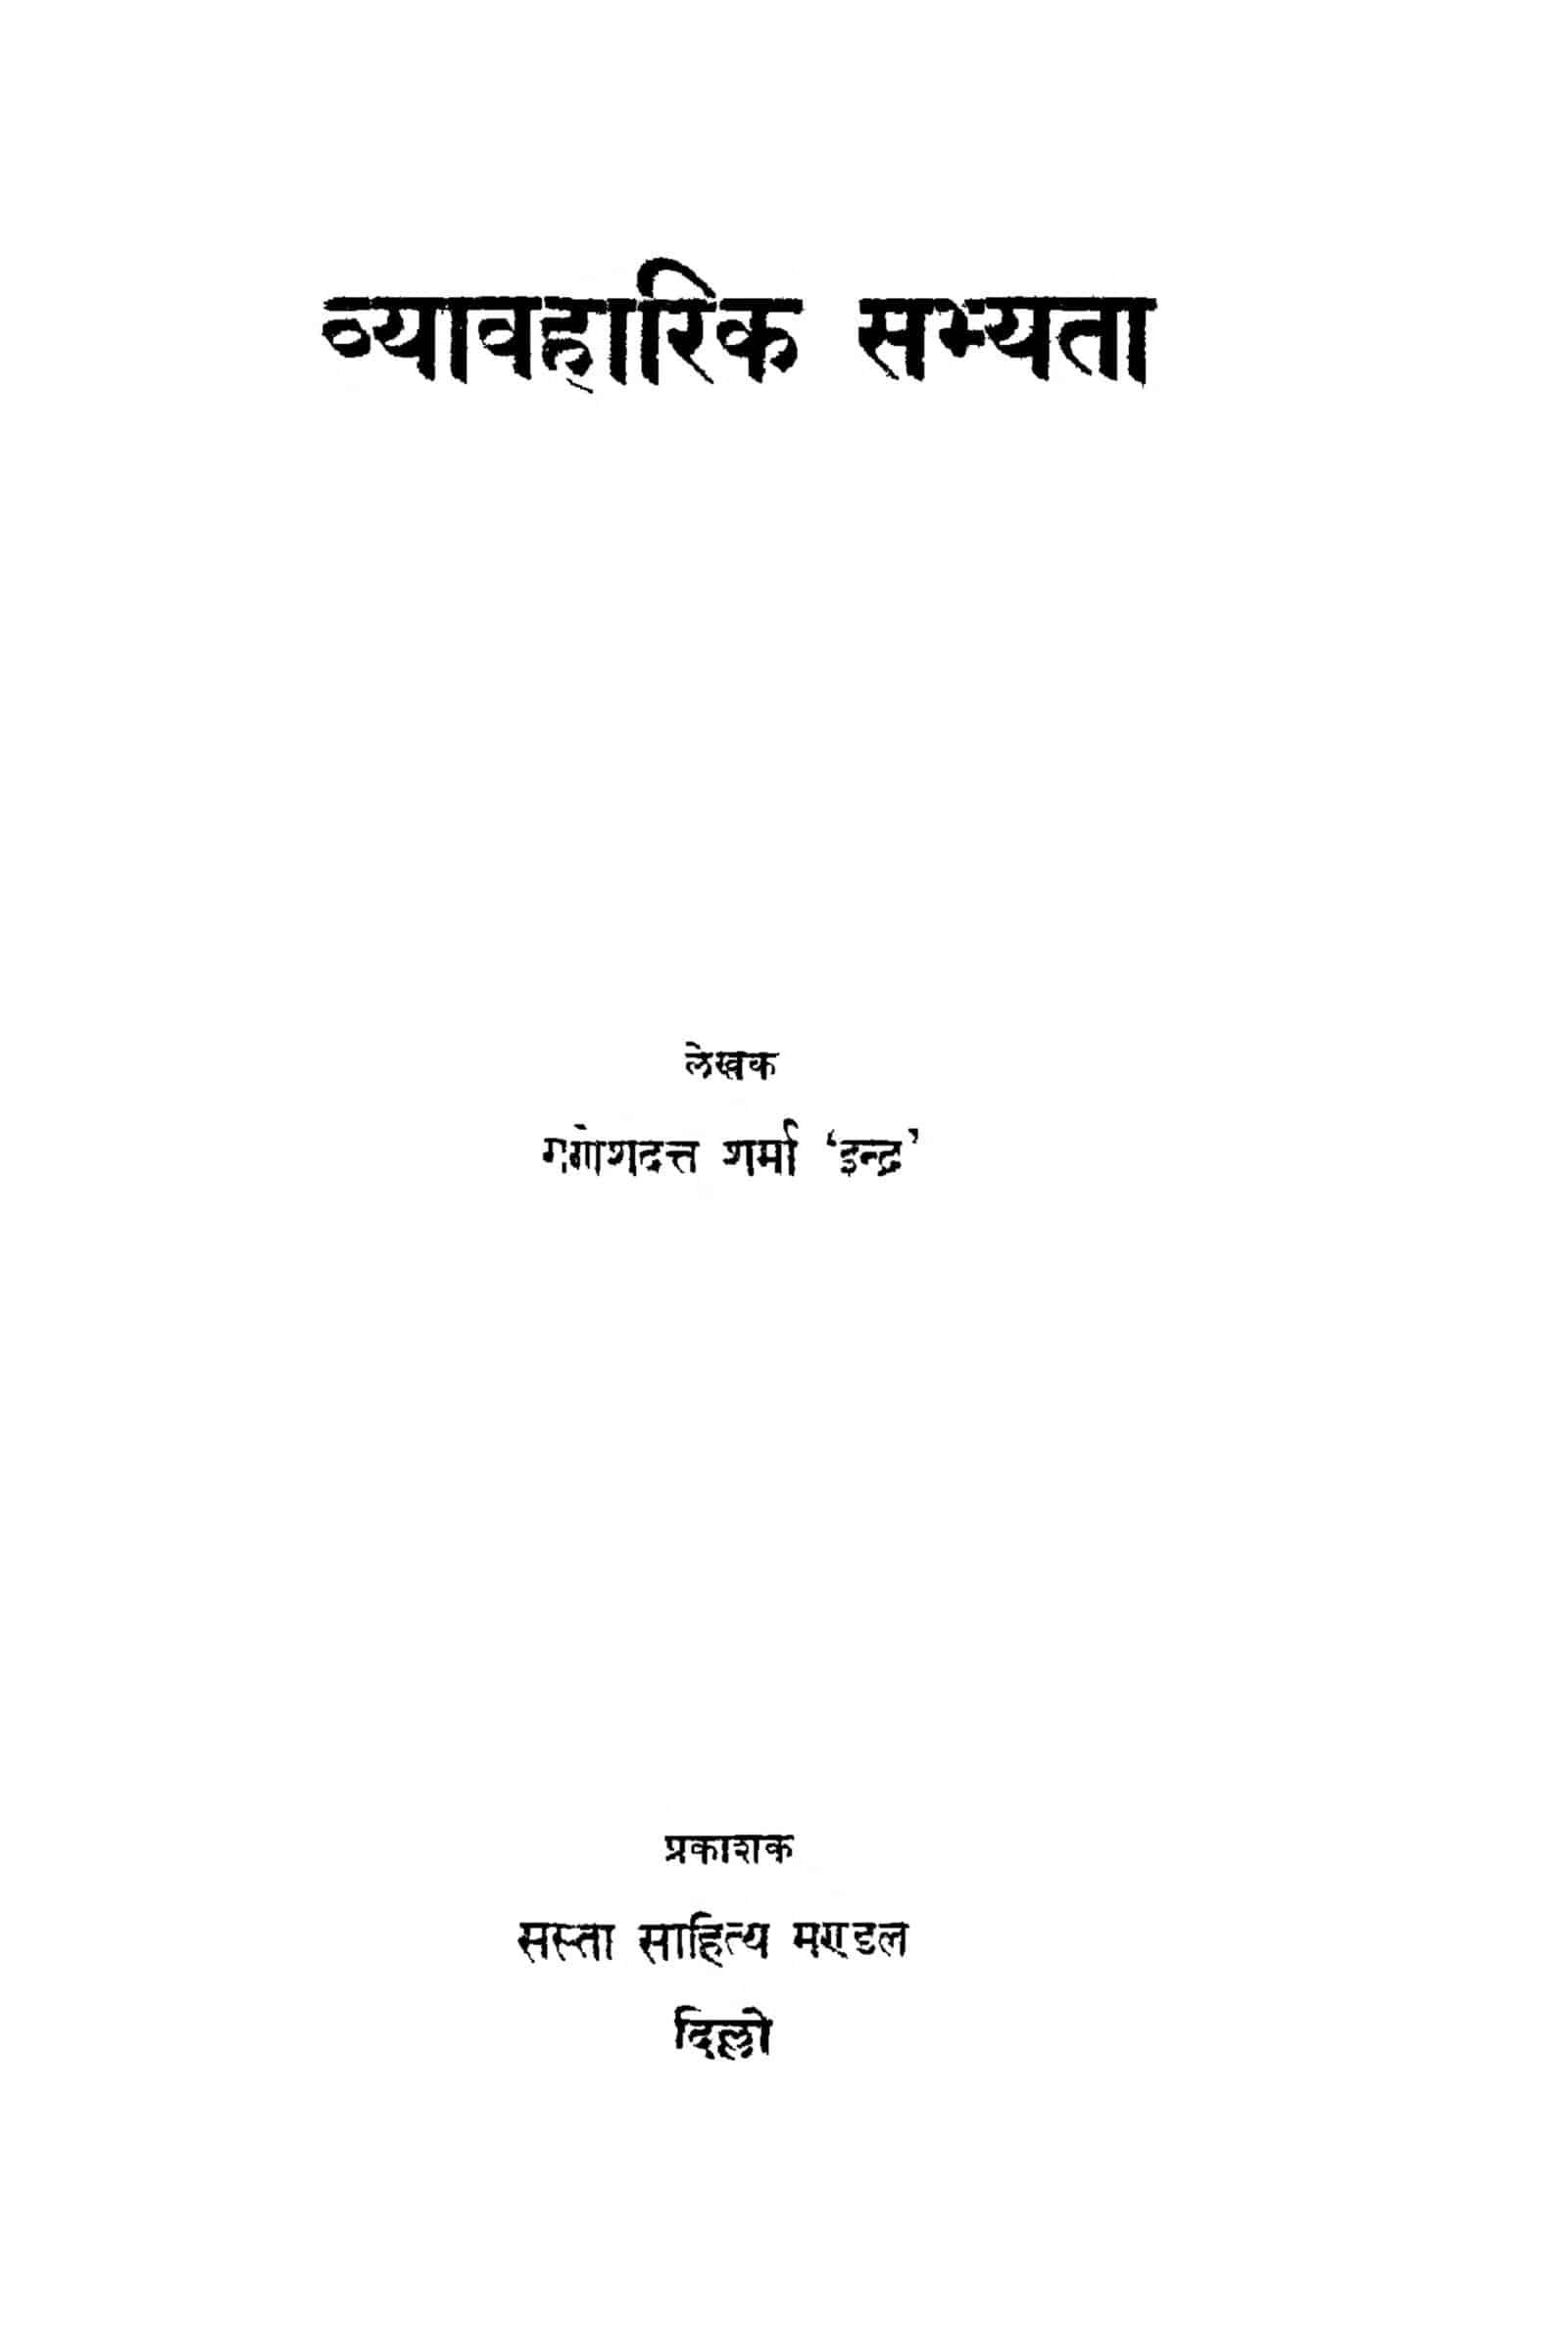 Book Image : व्यावहारिक सभ्यता - Vyavaharik Sabhyta